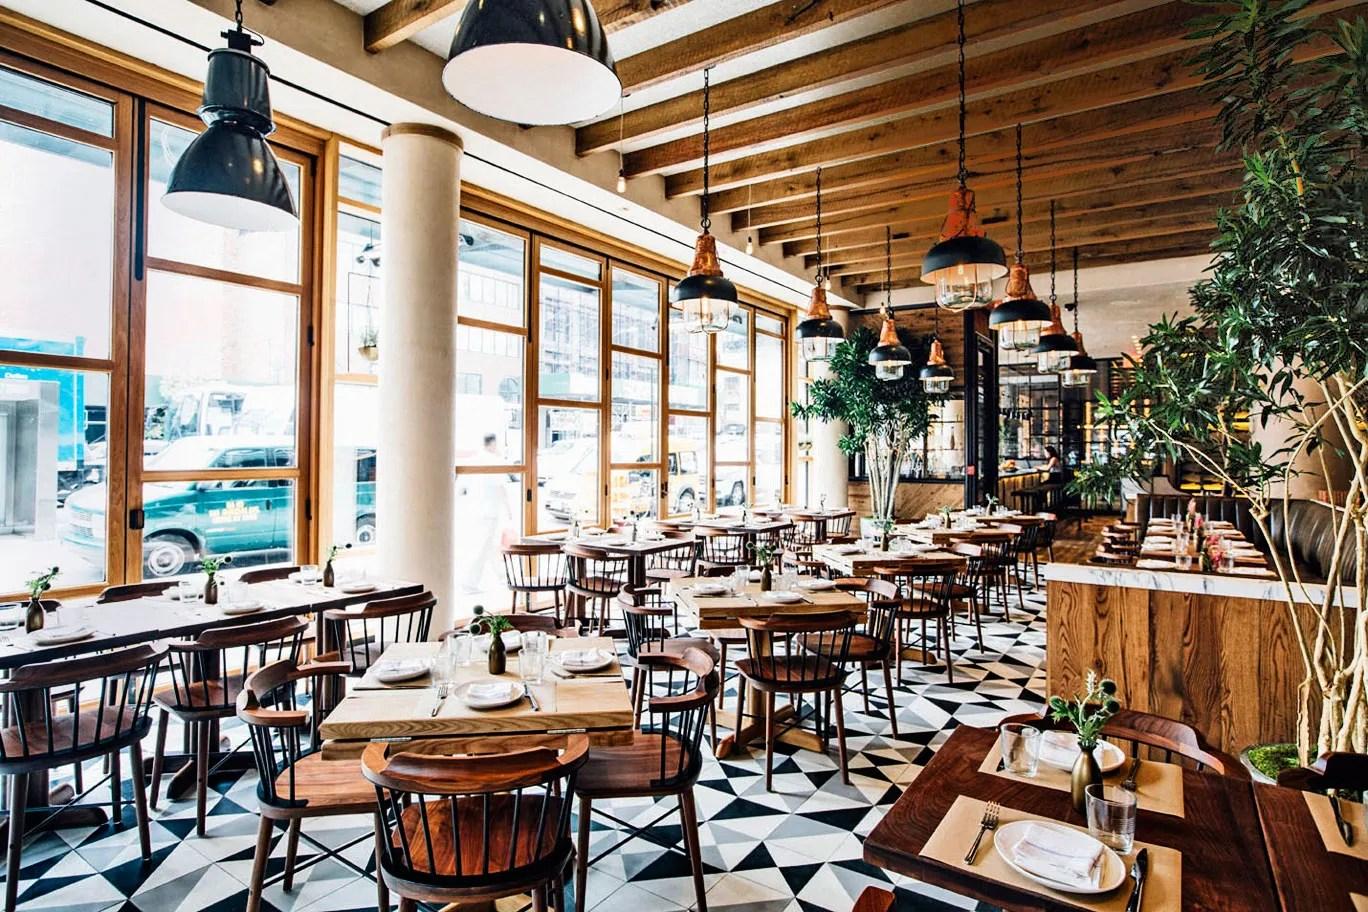 Chef Laurent Tourondel Opens New York City Restaurant L